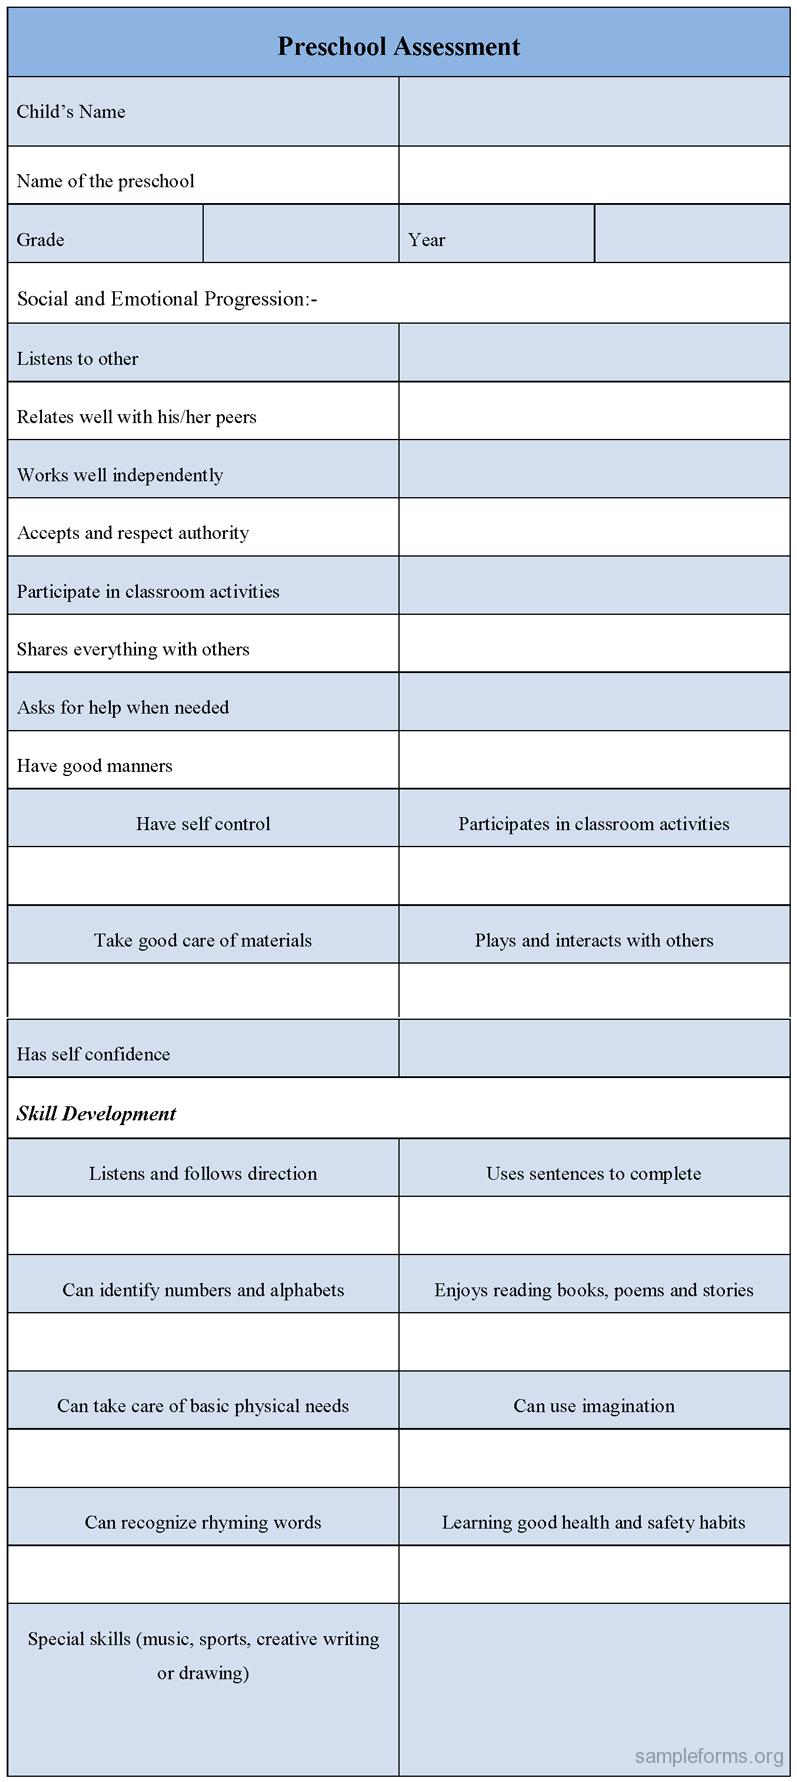 Preschool Assessment Form  Preschool Assessment Forms